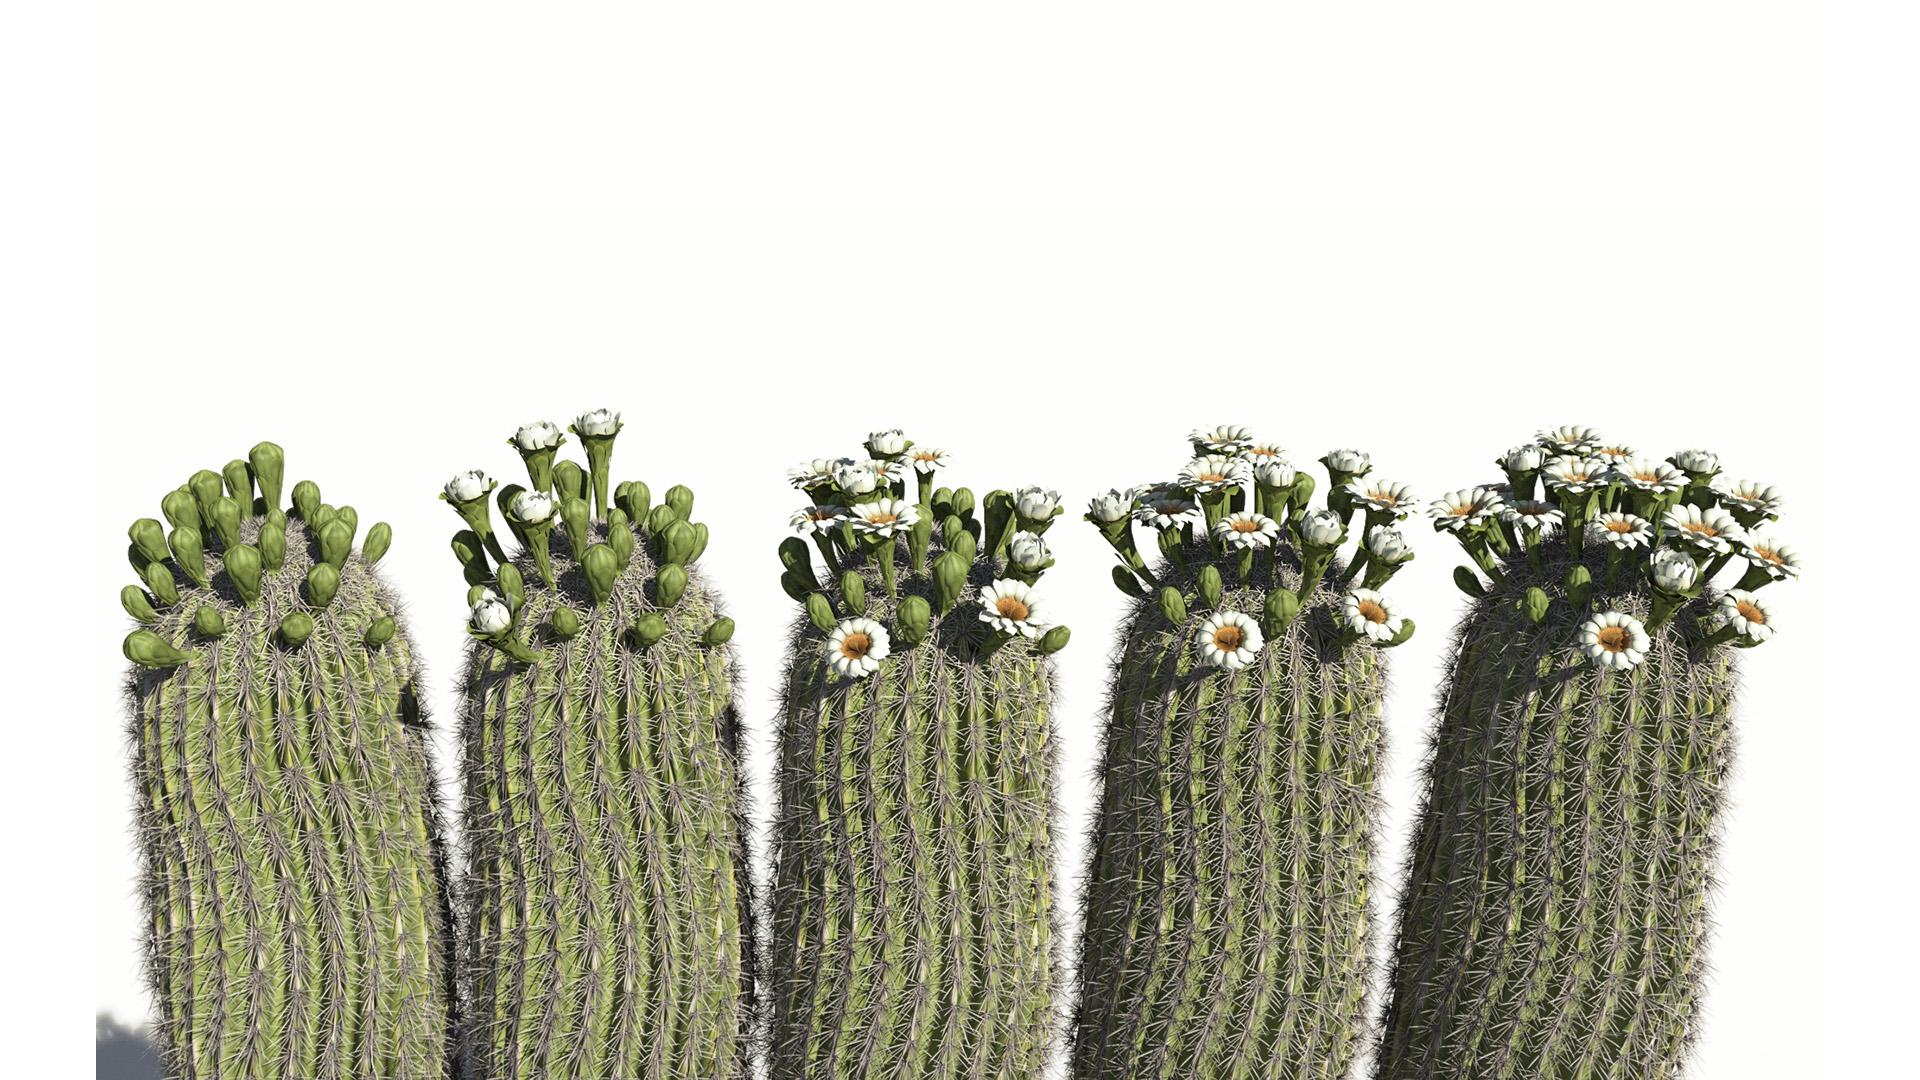 3D model of the Saguaro cactus Carnegiea gigantea season variations